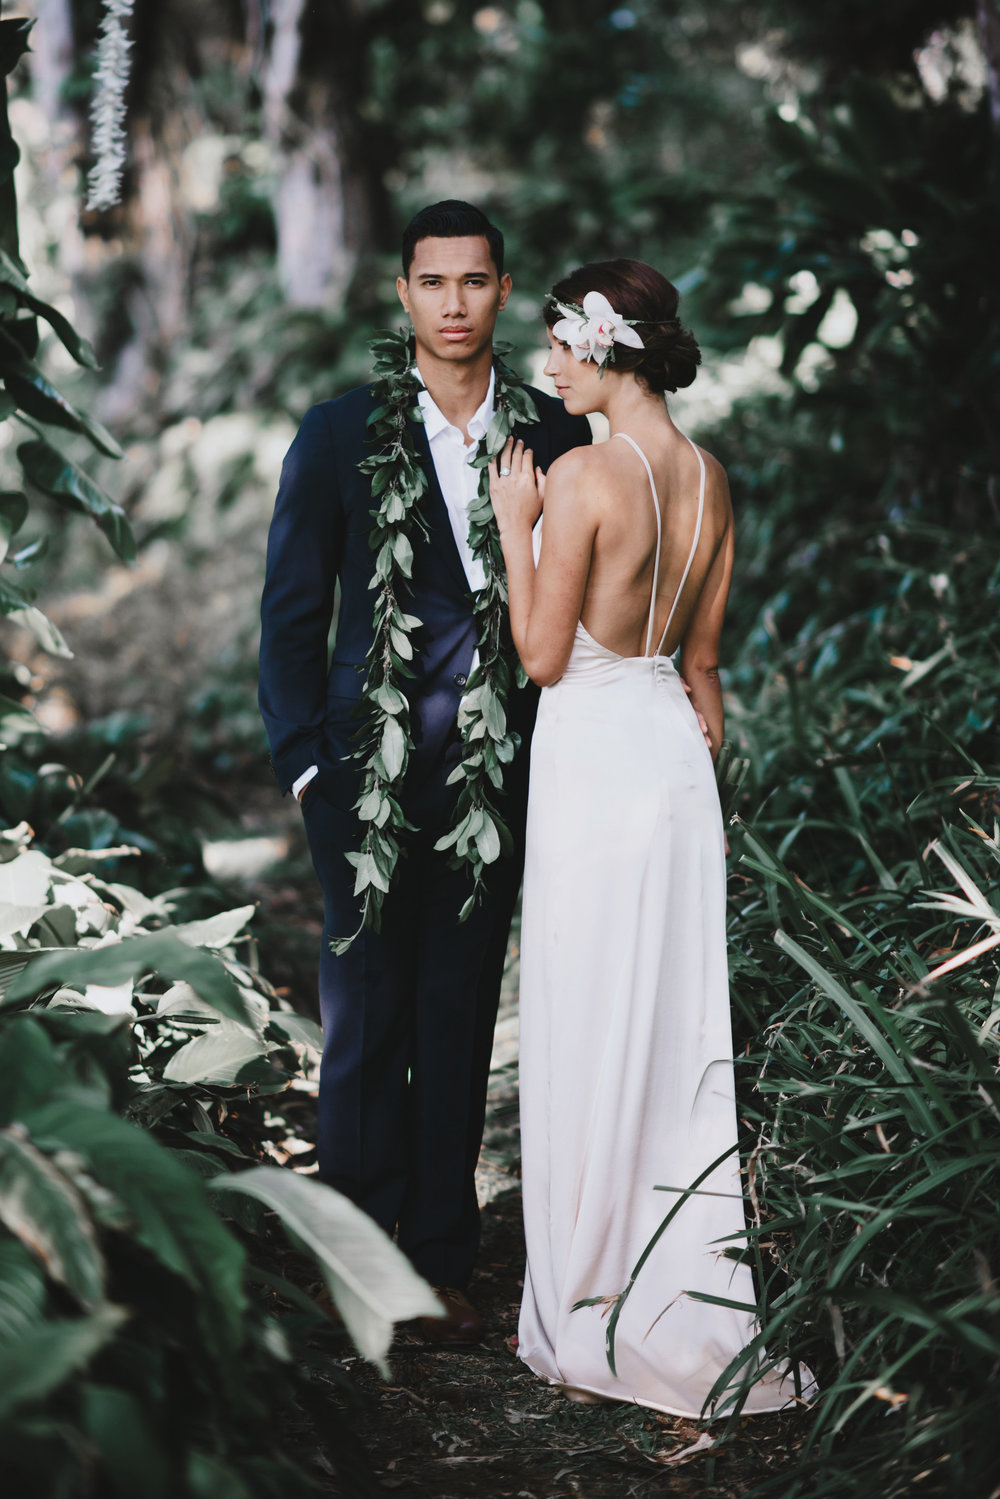 VSCO_Hawaii_Wedding_Photography_June_Cochran_146_6937.jpg